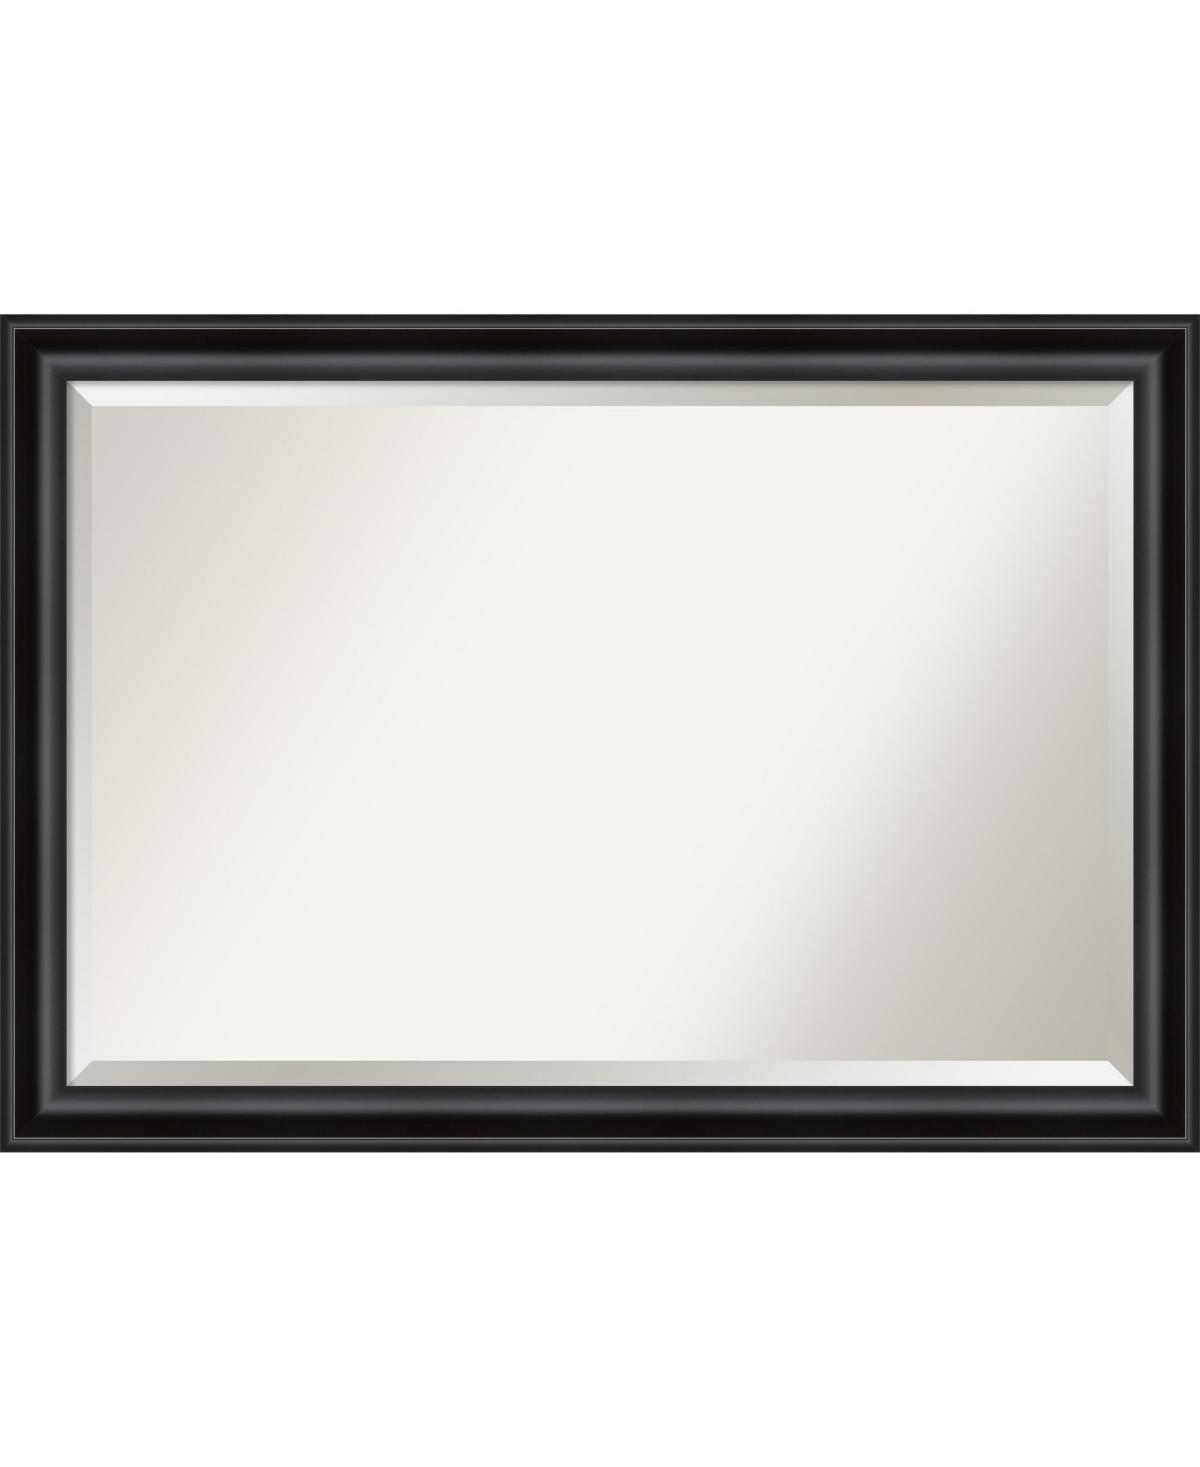 Amanti Art Grand Framed Bathroom Vanity Wall Mirror, 39.88